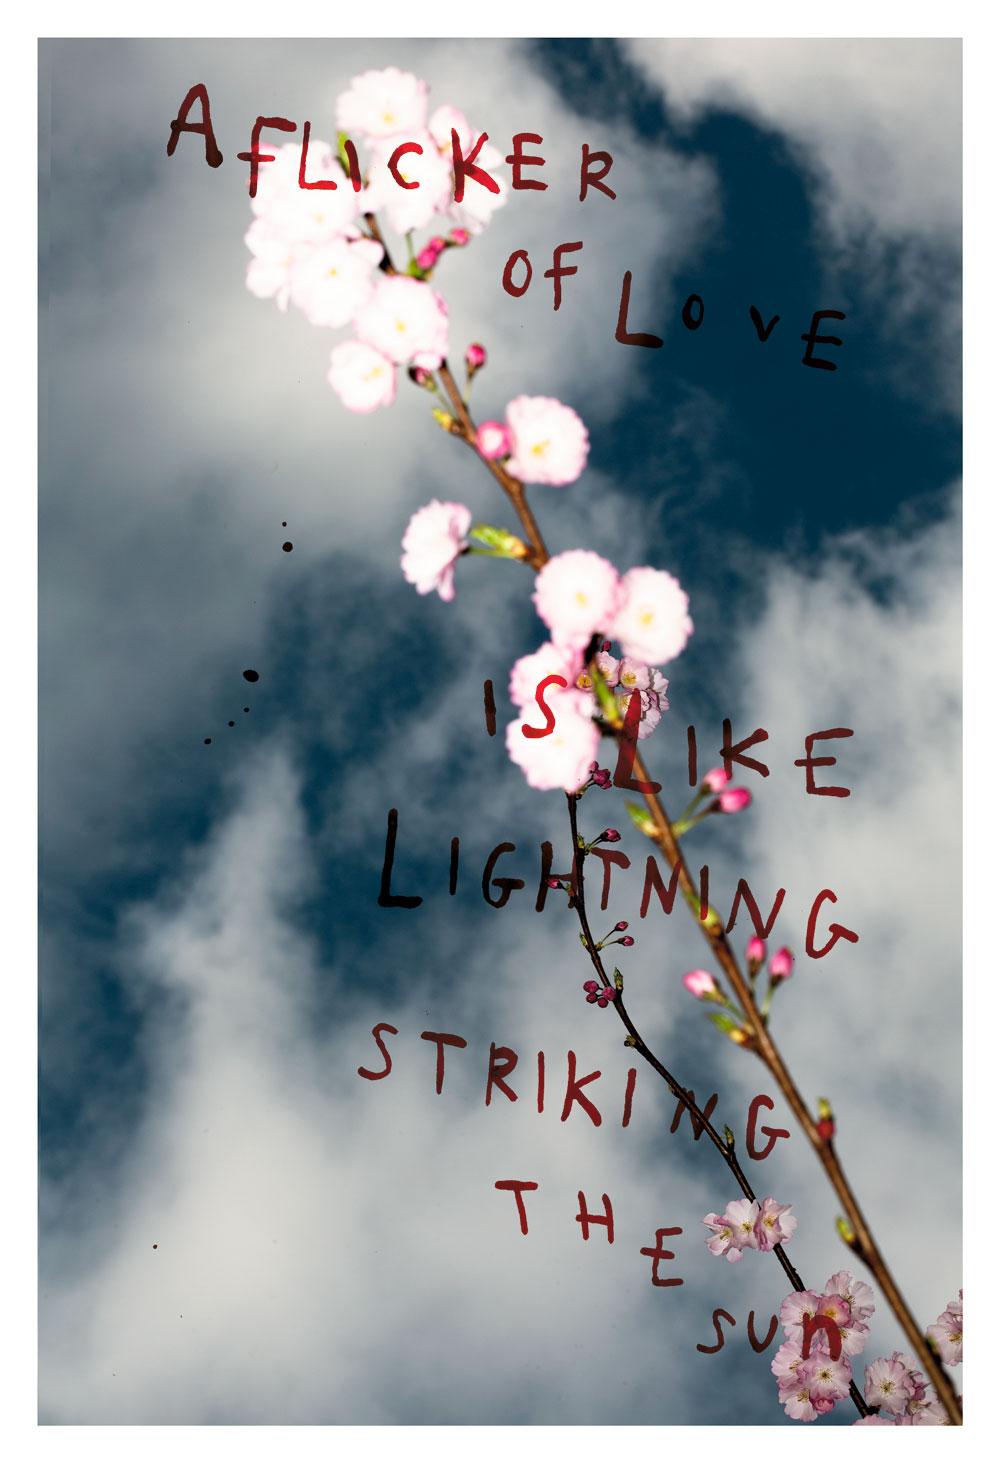 Melissa Spiccia | SEE FLOWERS IN HELL LIGHTNING STRIKING THE SUN MELISSA SPICCIA